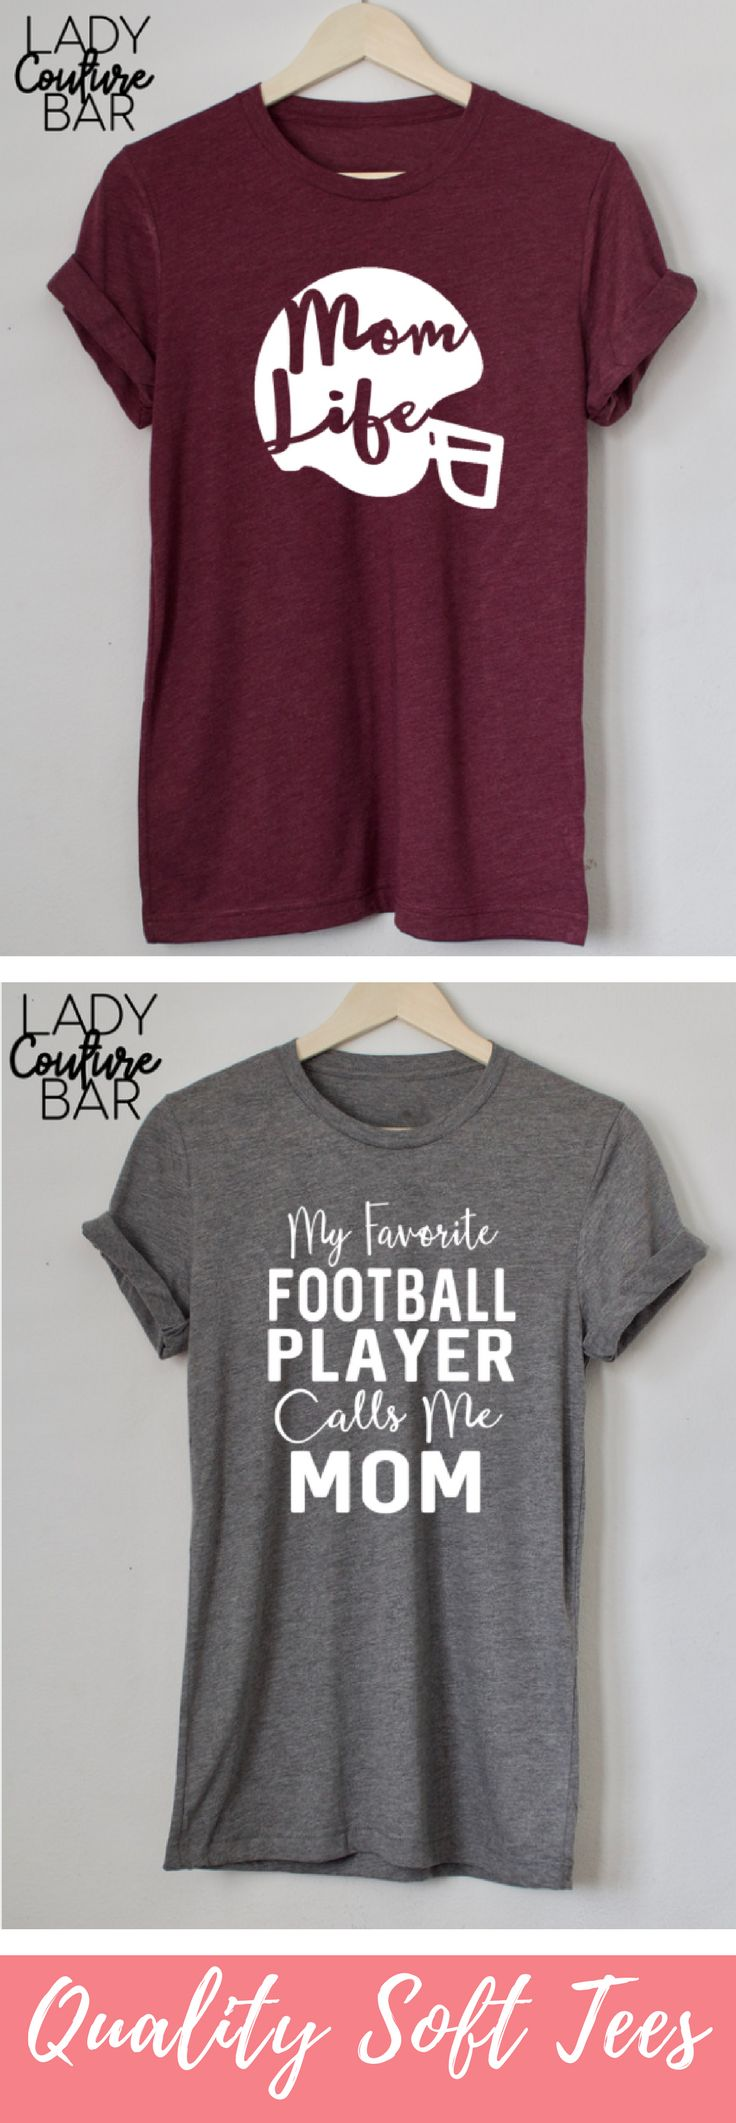 My favorite Football Players call me MOM! ❤️